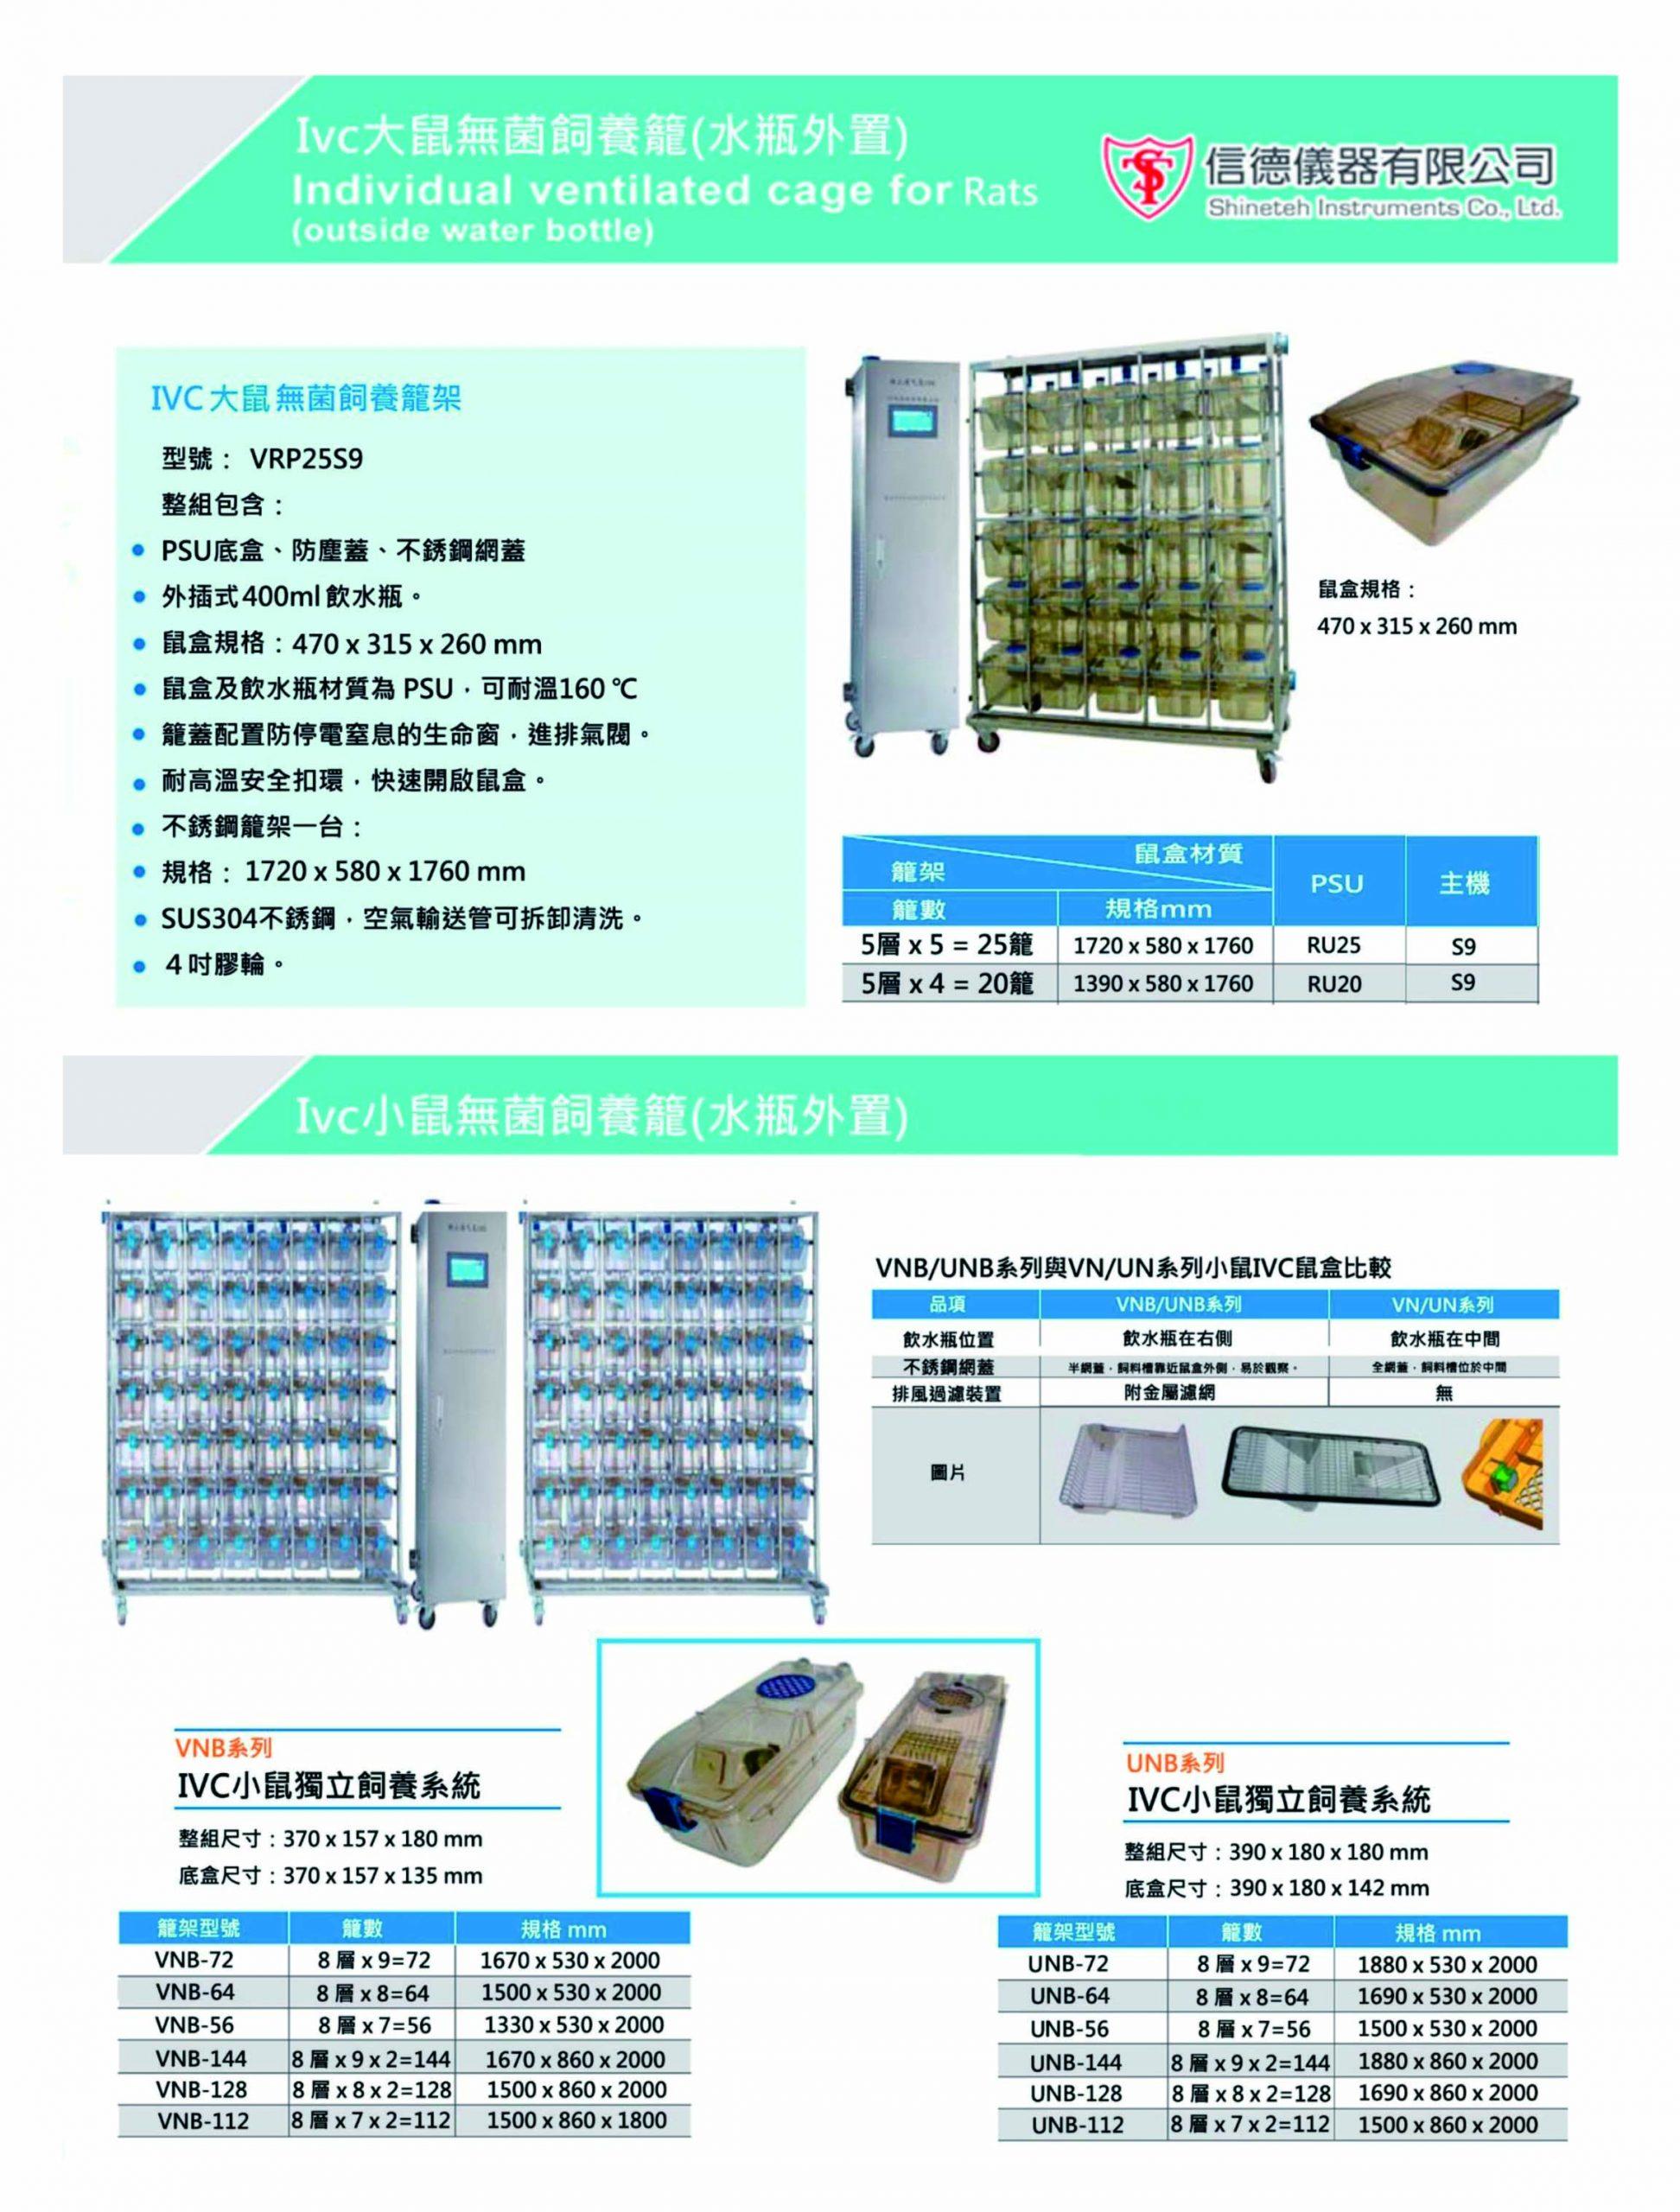 IVC 系統